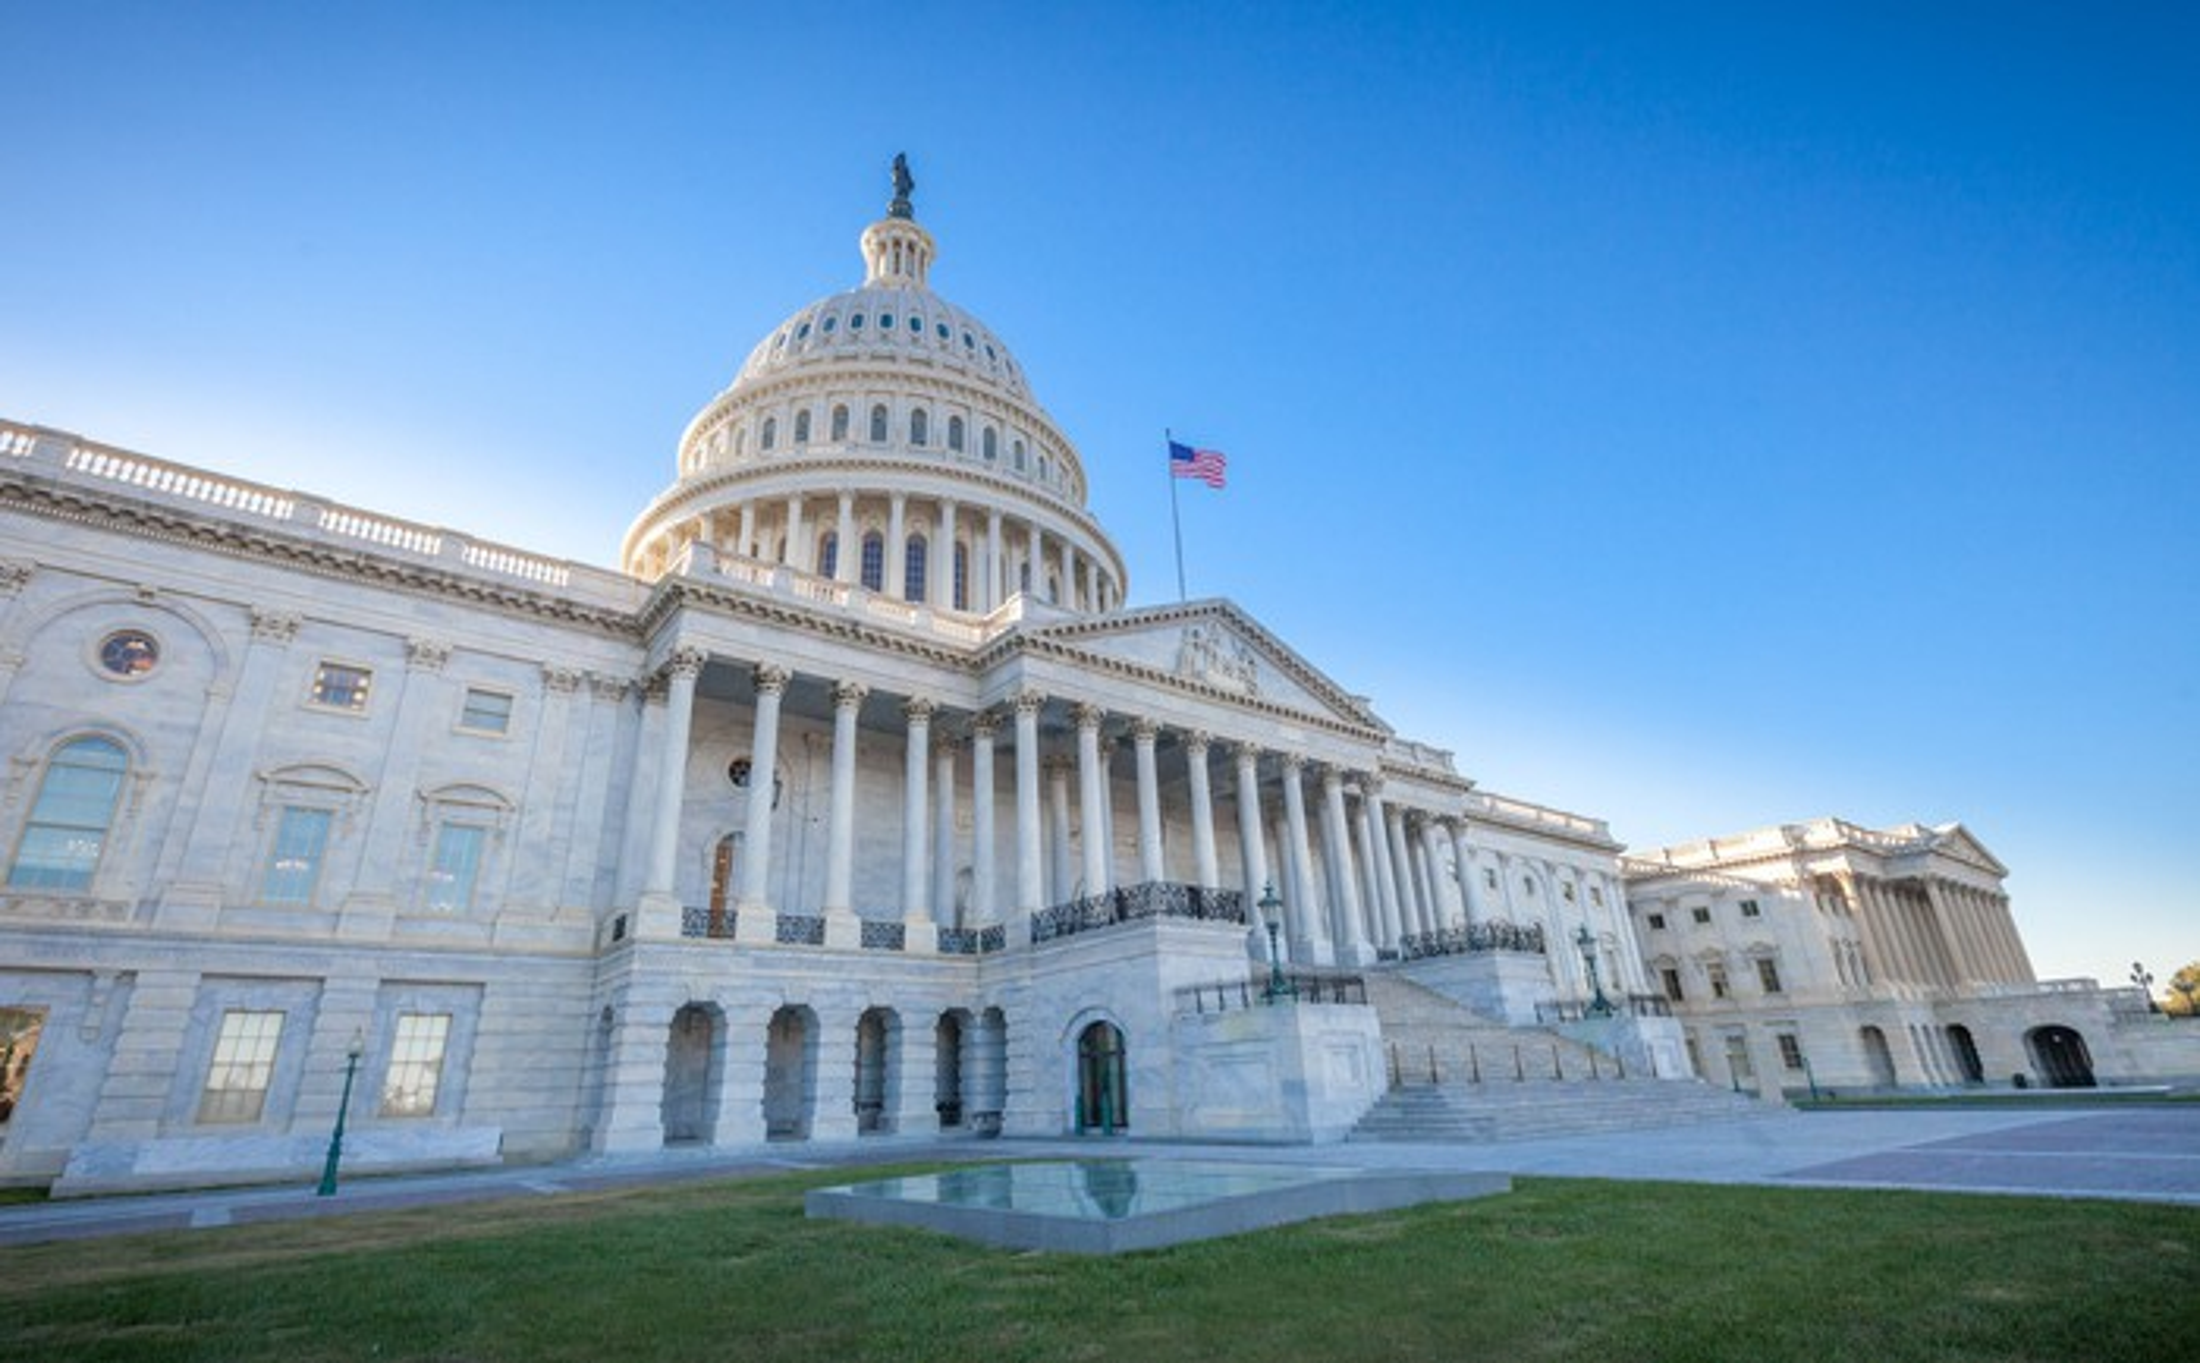 A facade of the Capitol building in Washington, D.C.